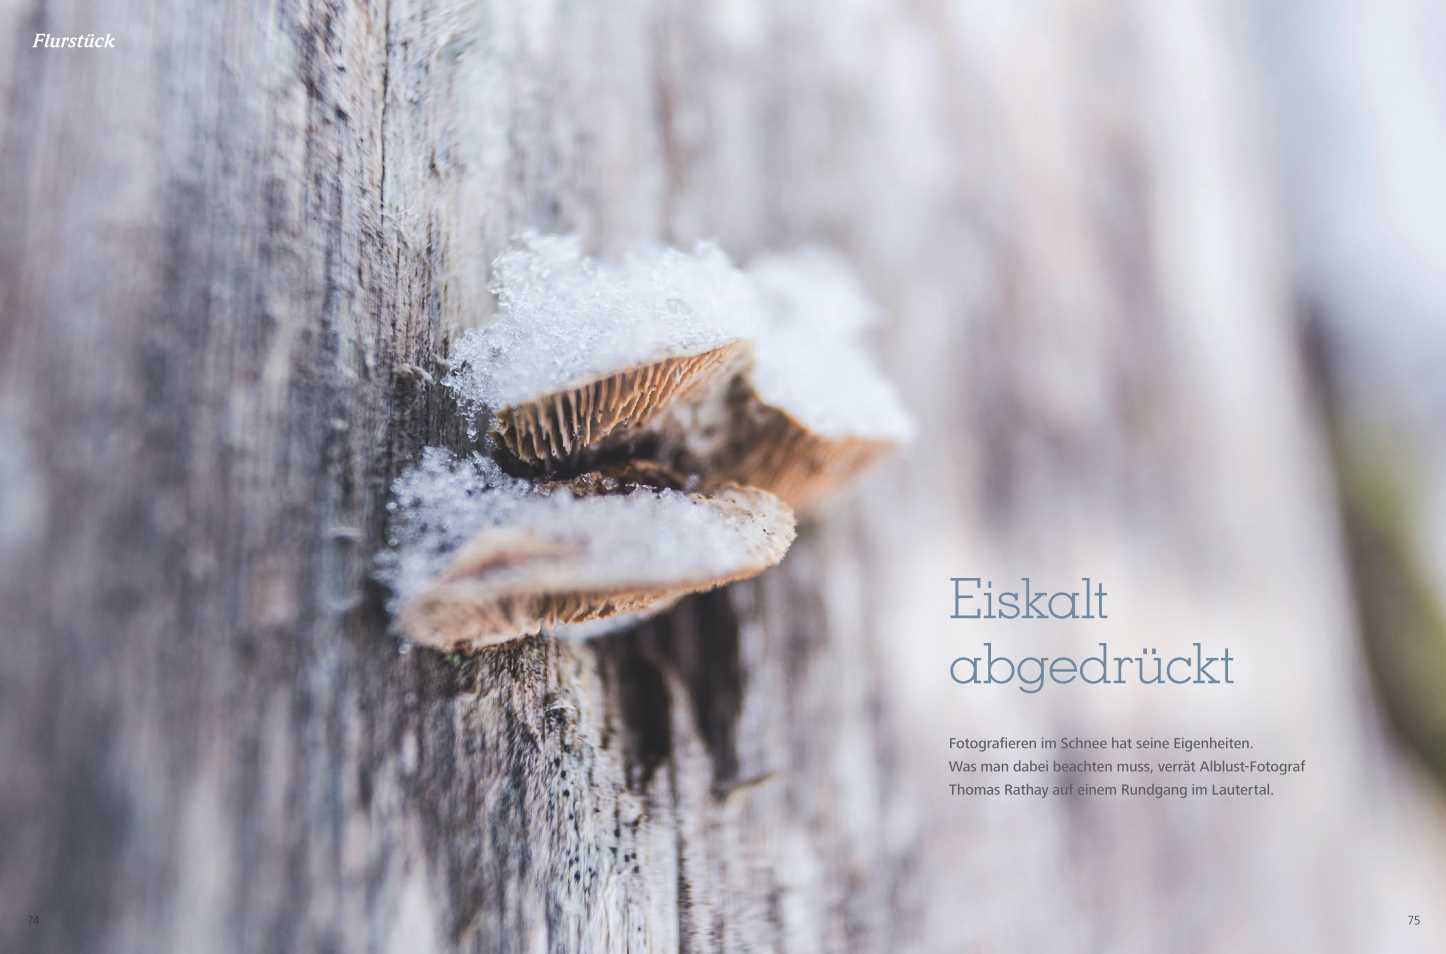 Winterfototipps von Thomas Rathay.